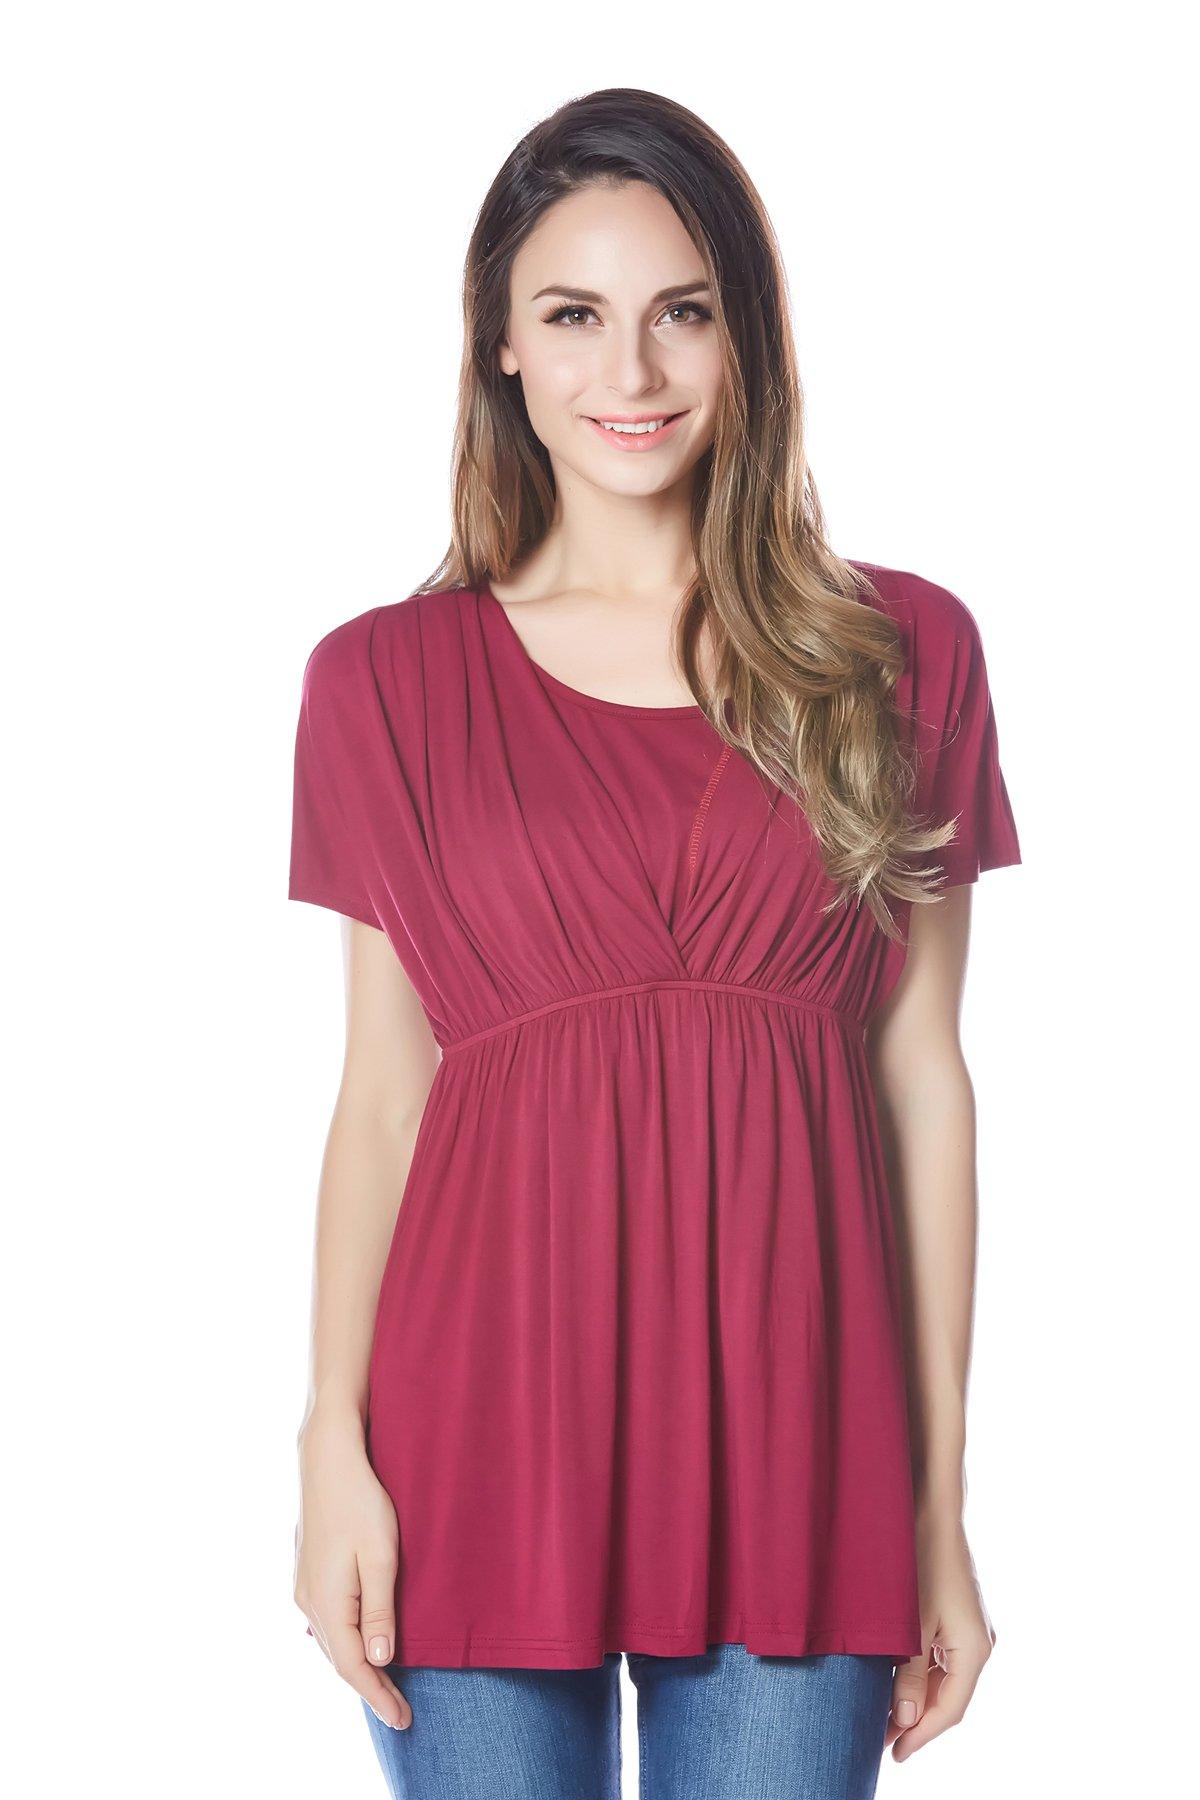 Bearsland Women's Breastfeeding and Nursing Summer Top PurpleRed Size XL